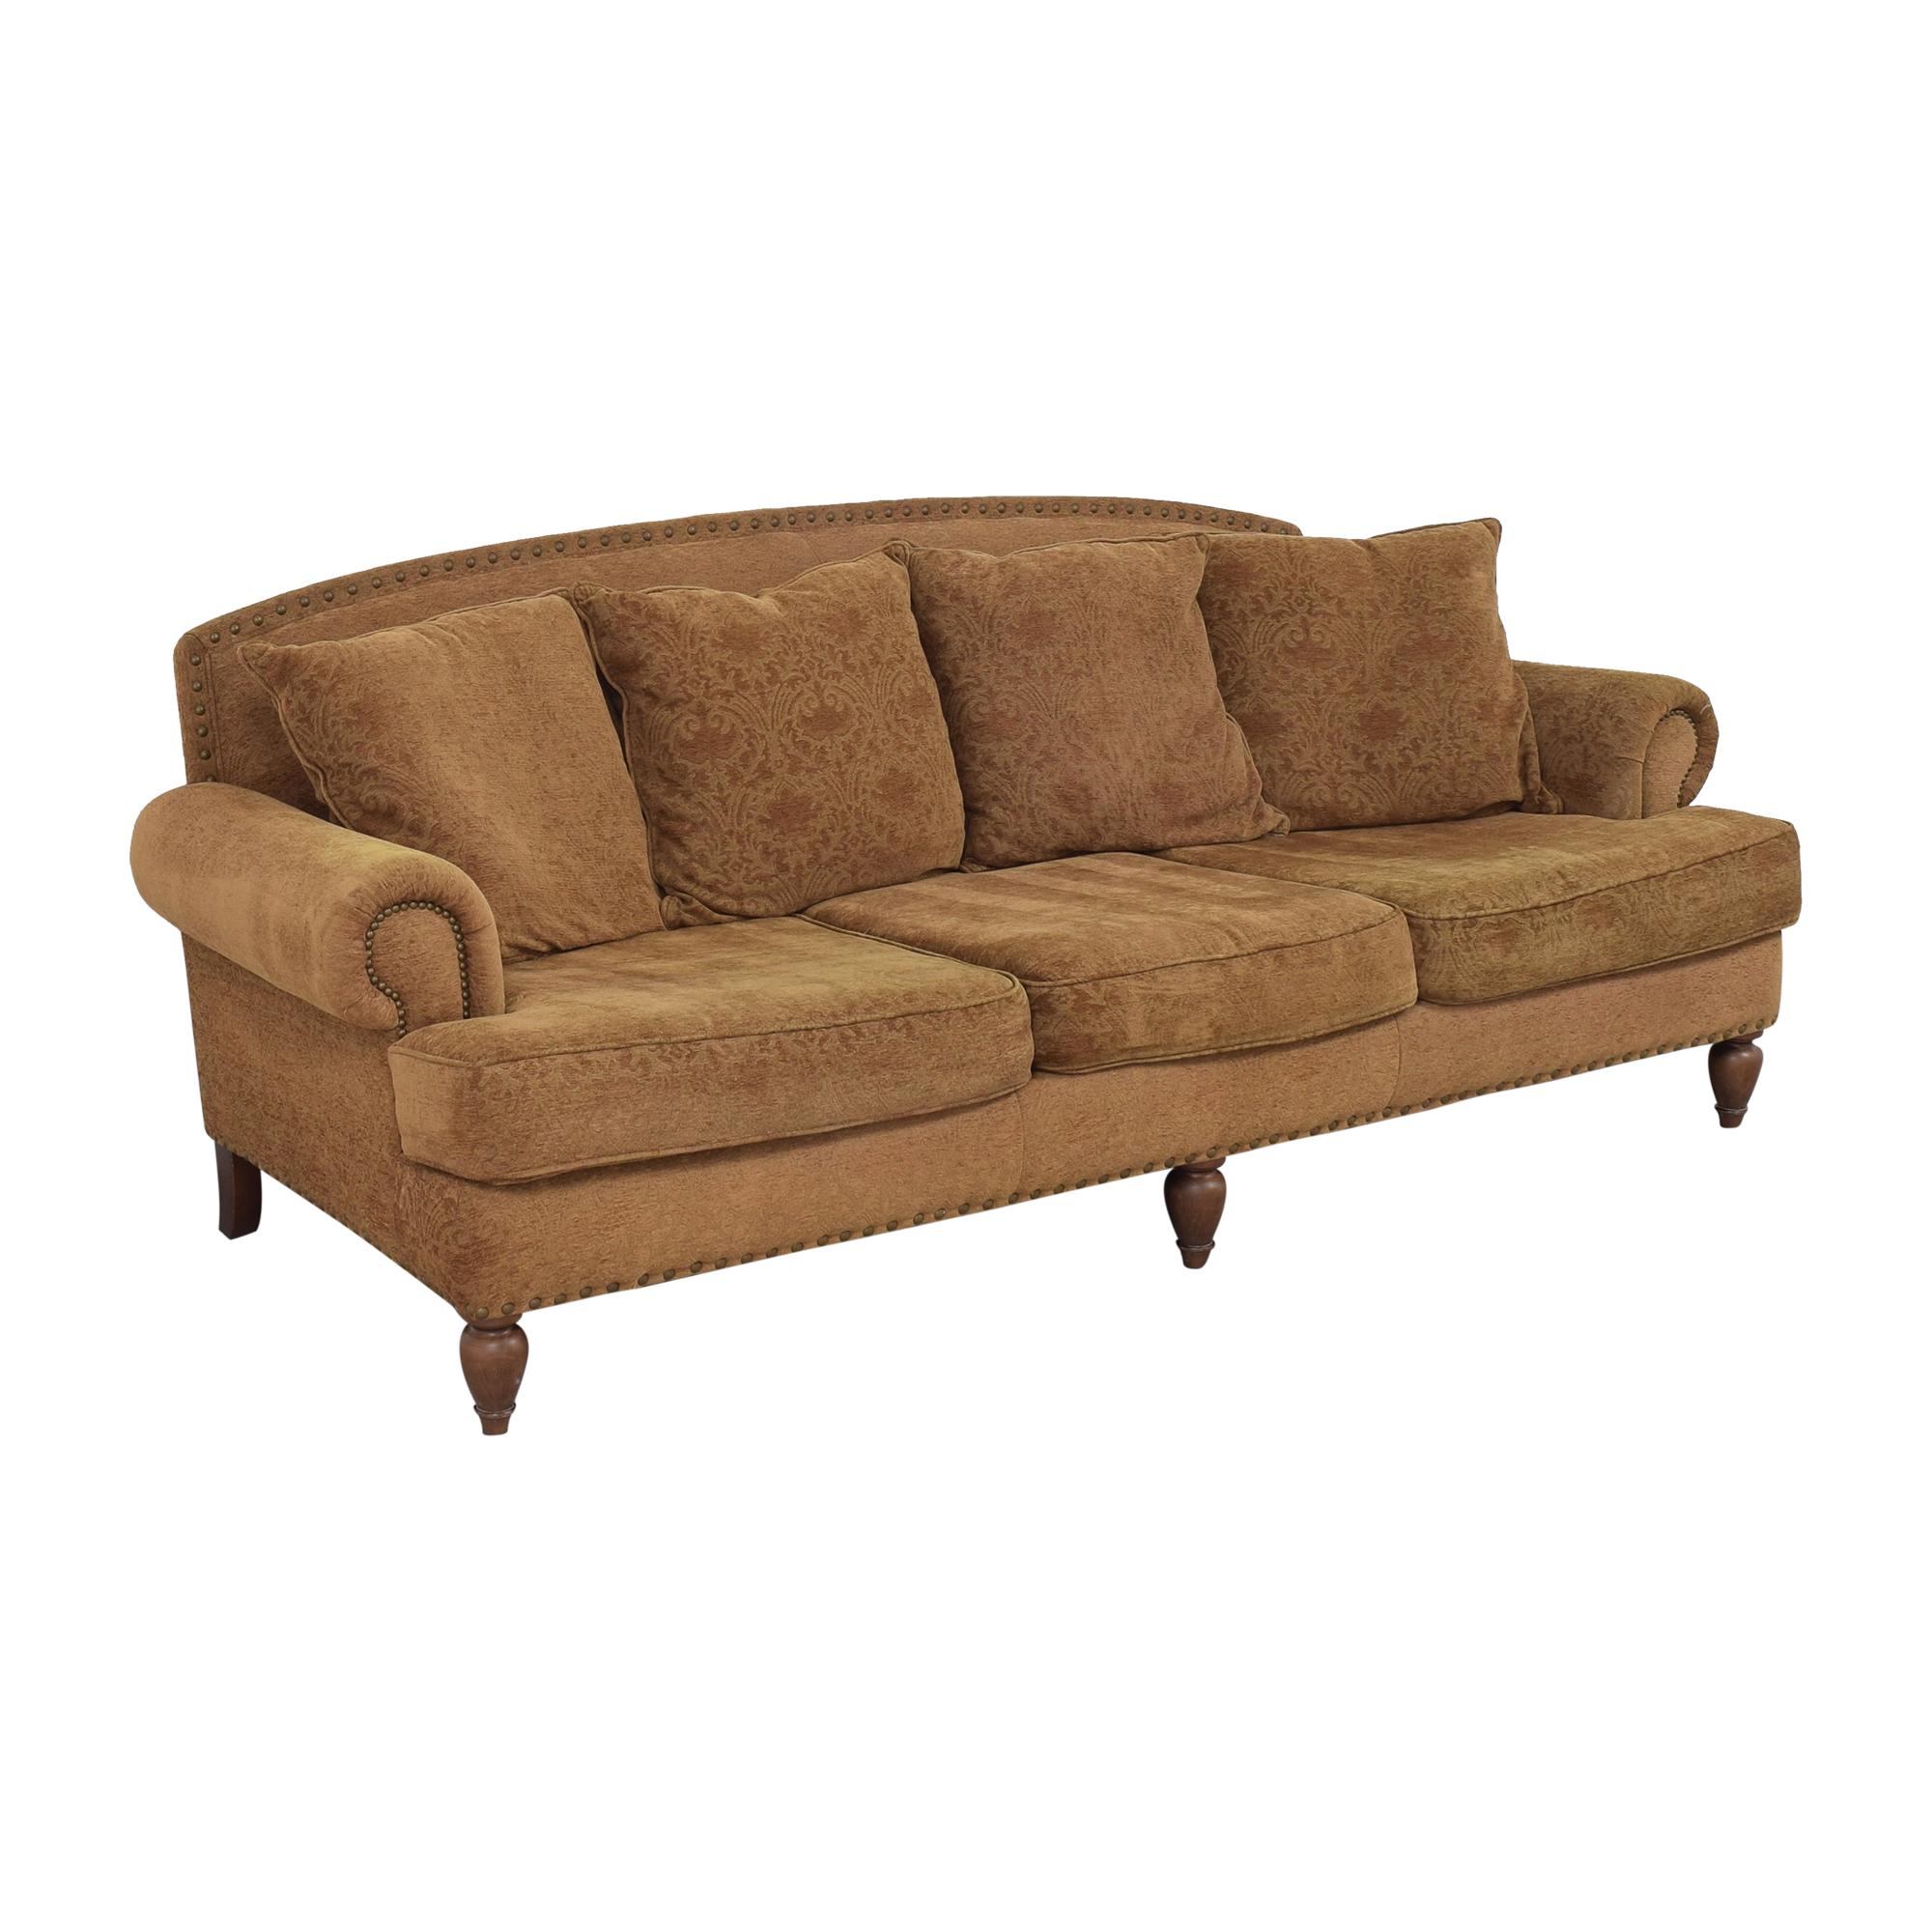 Bernhardt Bernhardt Three Cushion Roll Arm Sofa brown